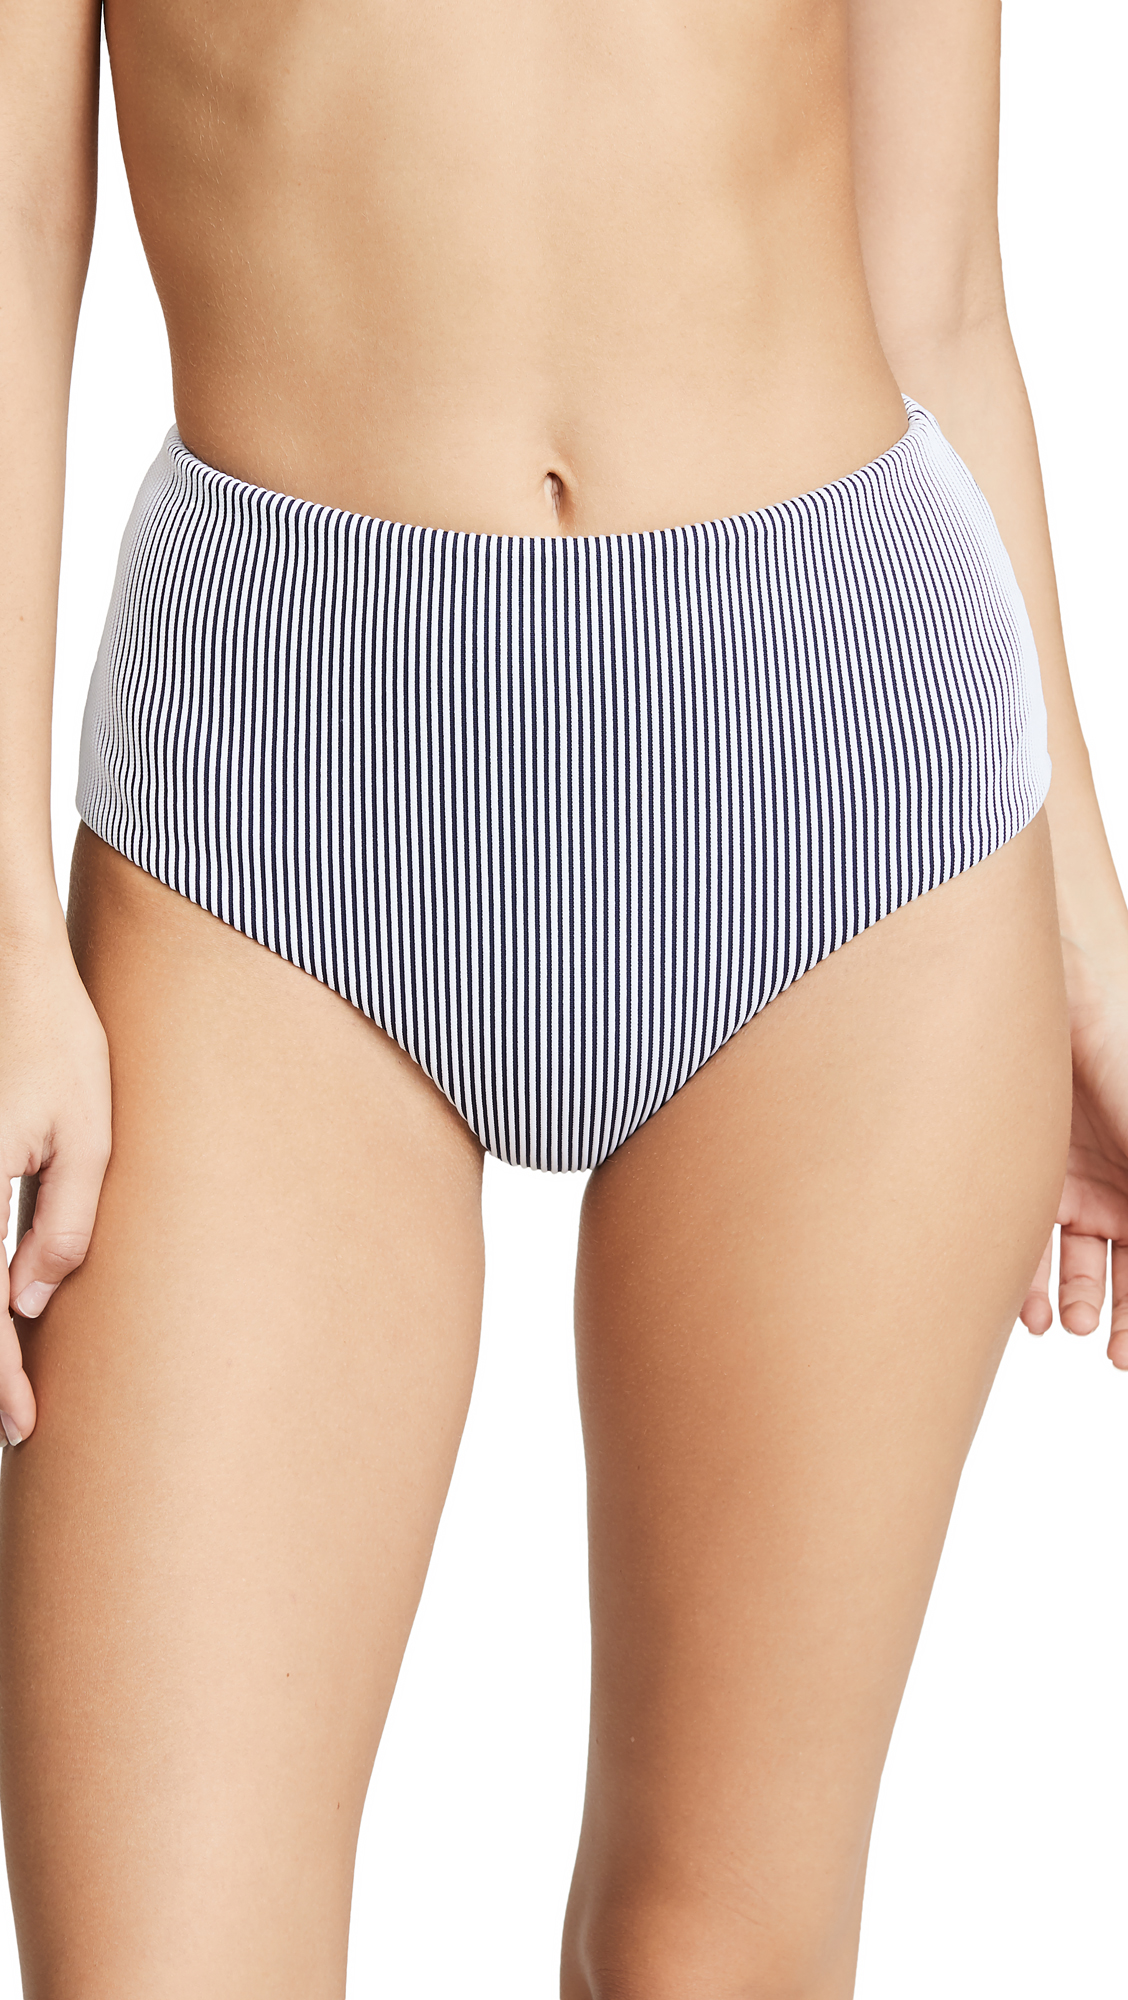 Eberjey Porto Dita Bikini Bottoms - Shore Blue/White